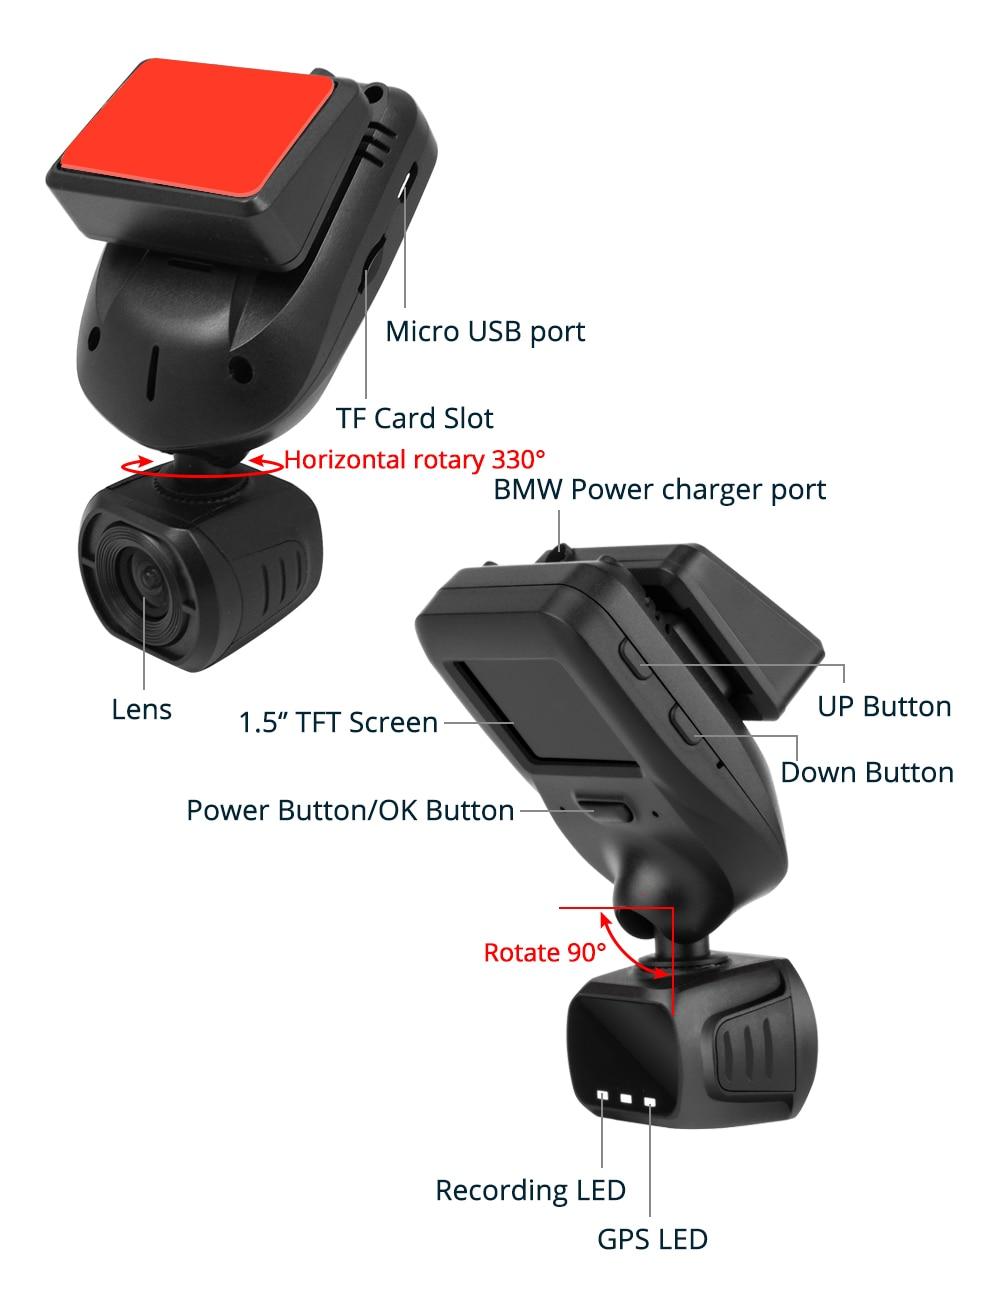 Conkim Nieuwe Collectie Mini Q9 Dash Camera Auto DVR Condensator 1296P 1080P Full HD Verborgen Auto Camera GPS LDWS Parking Modus + 32GB TF - 4